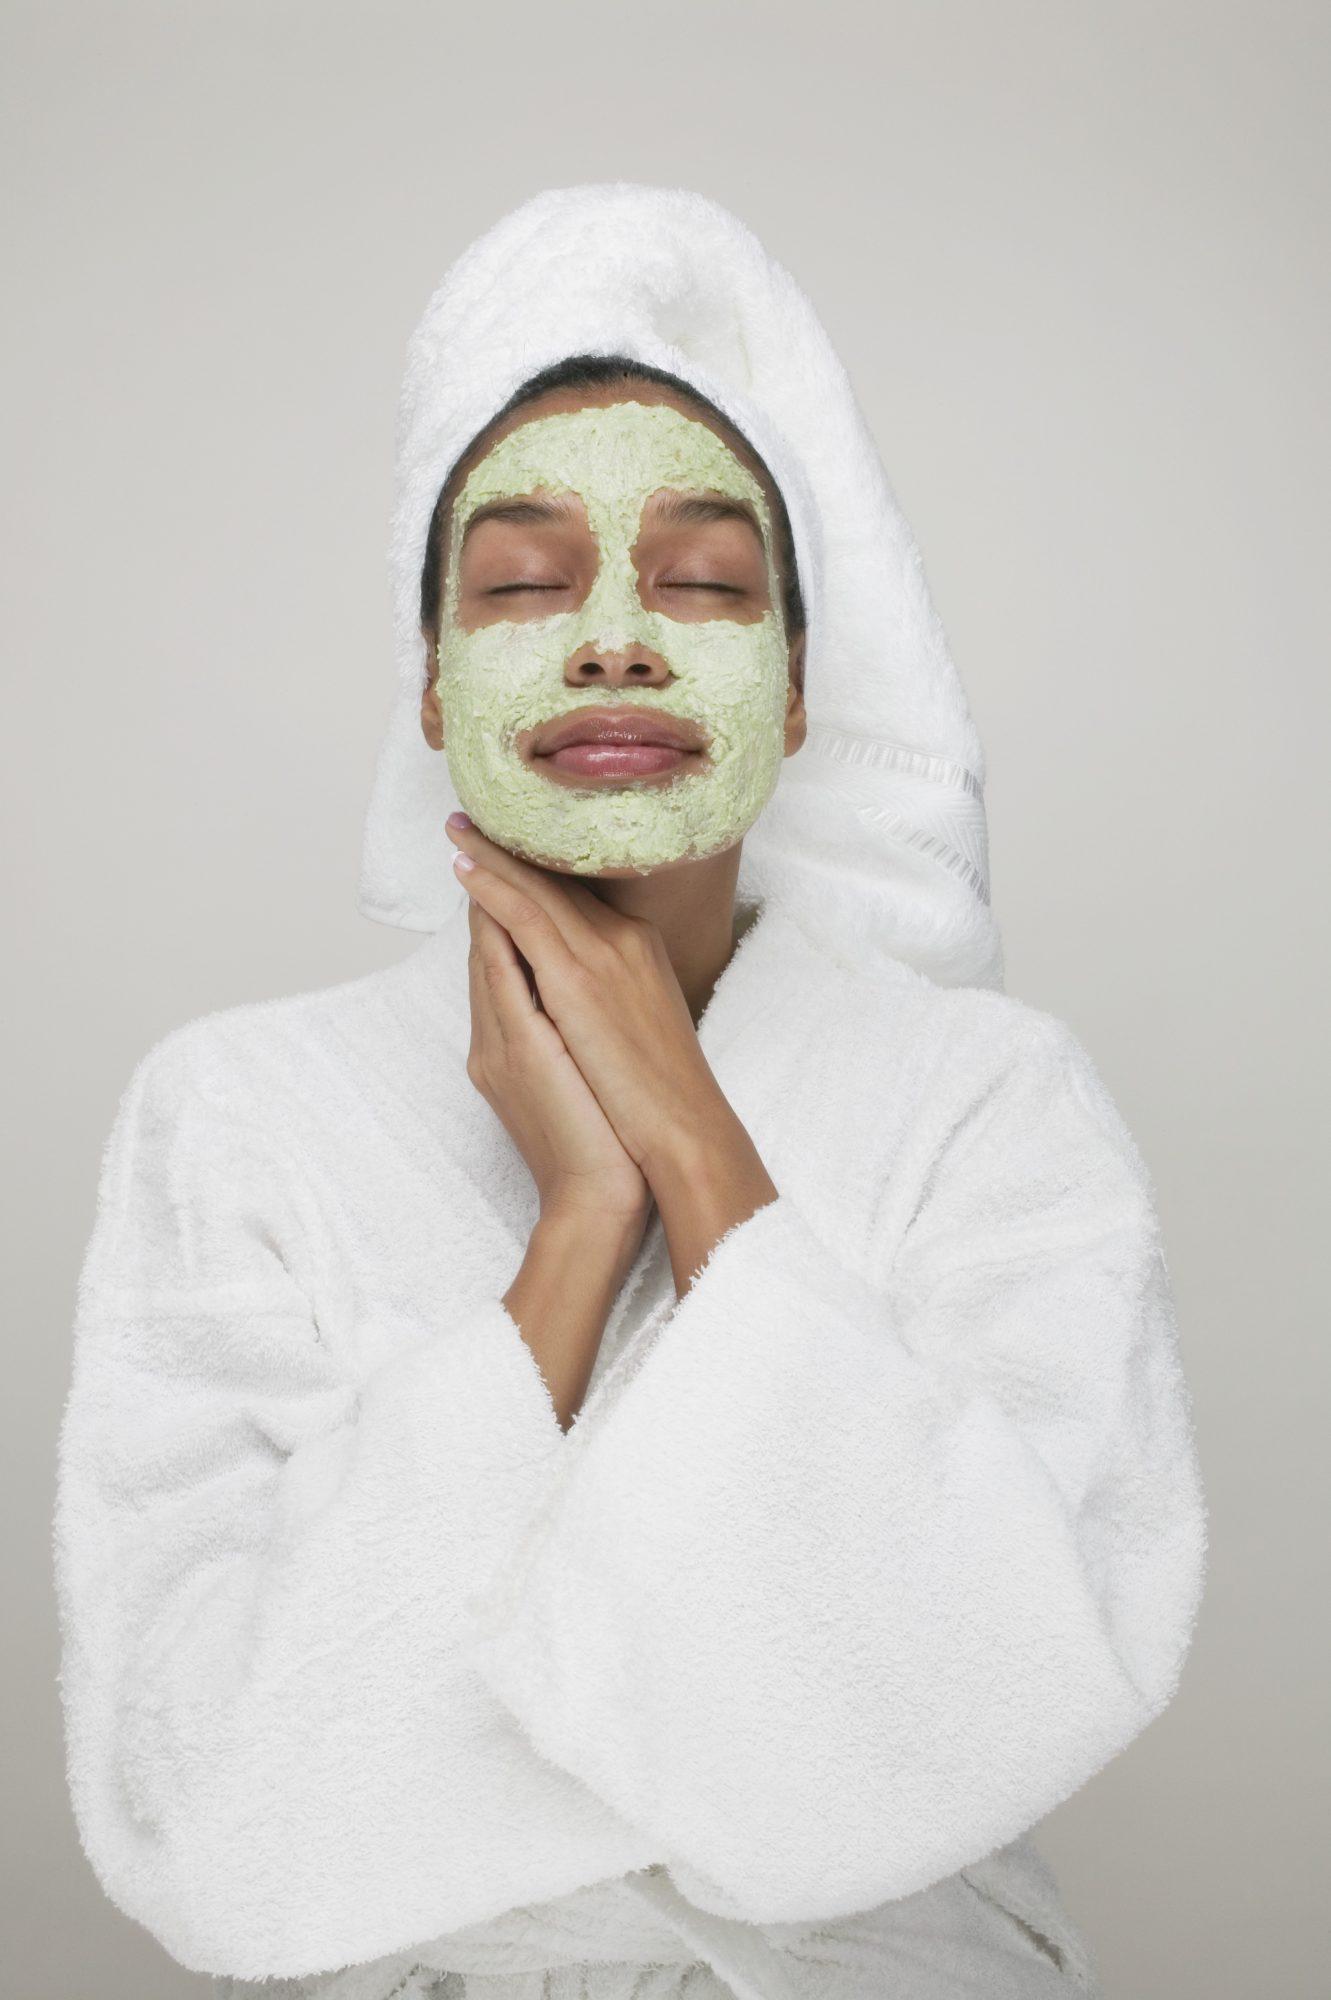 Facial casero, piel, mascarilla, coronavirus